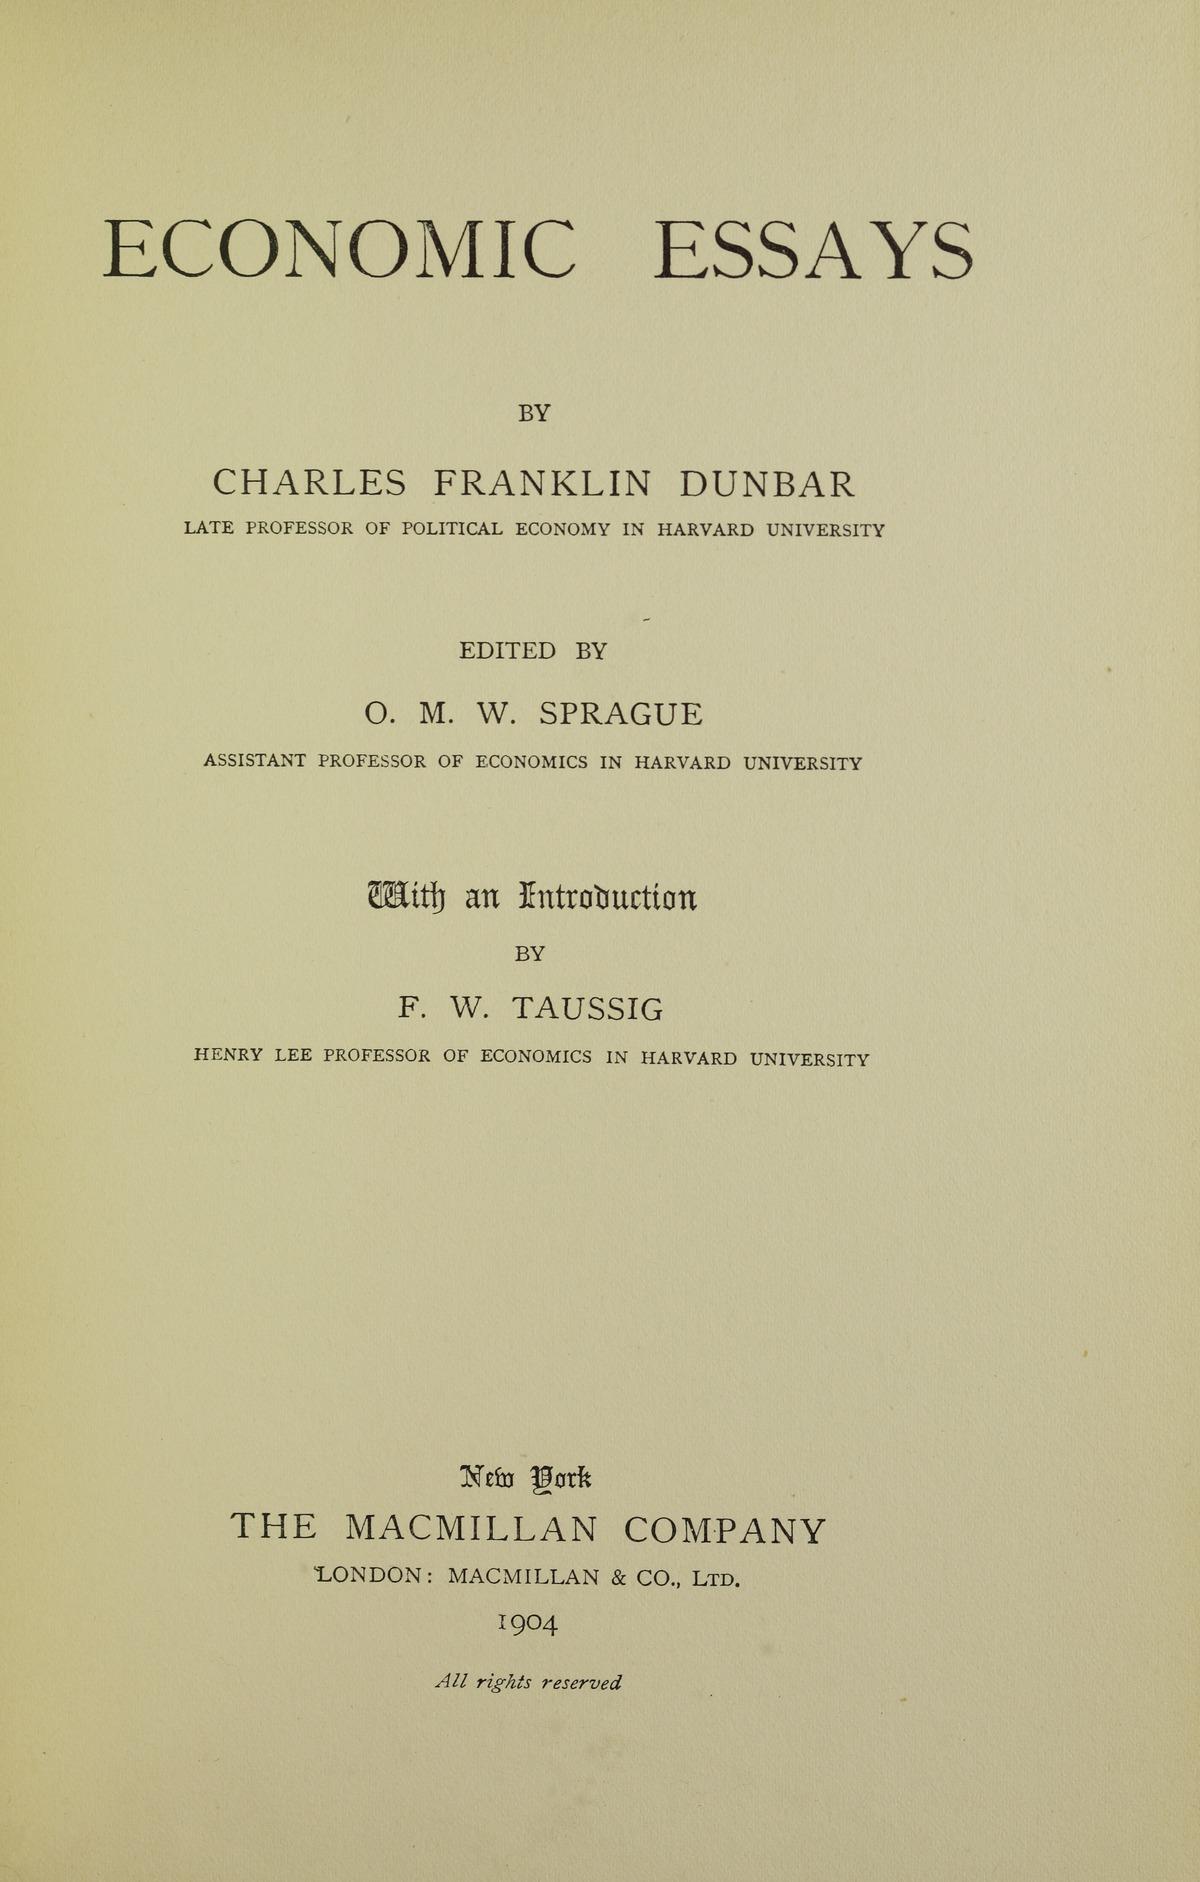 charles franklin dunbar